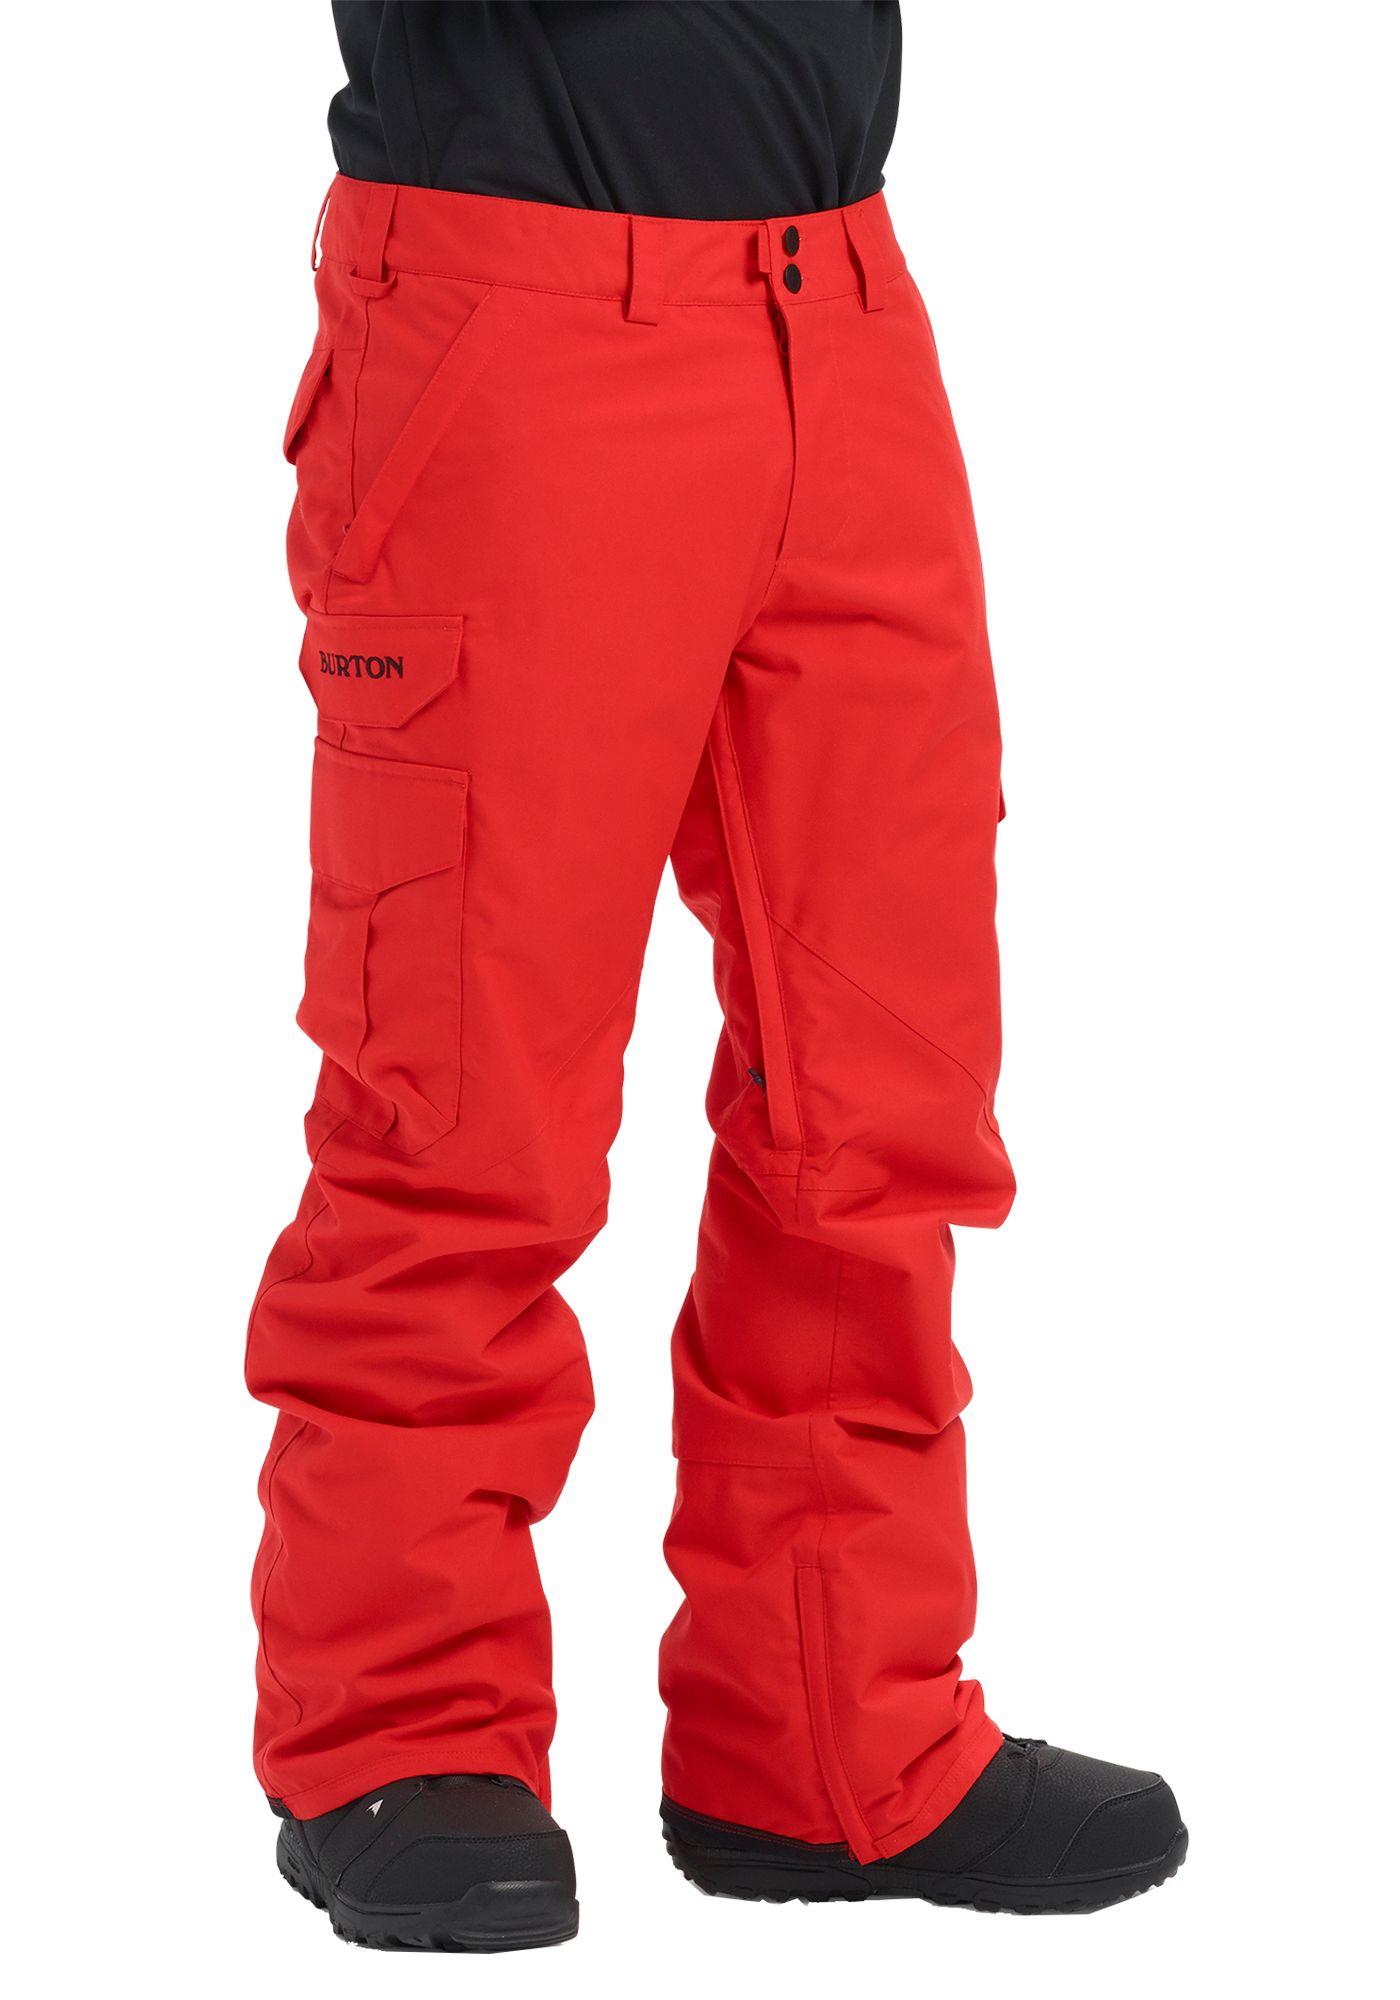 Burton Men's Cargo Shell Pants